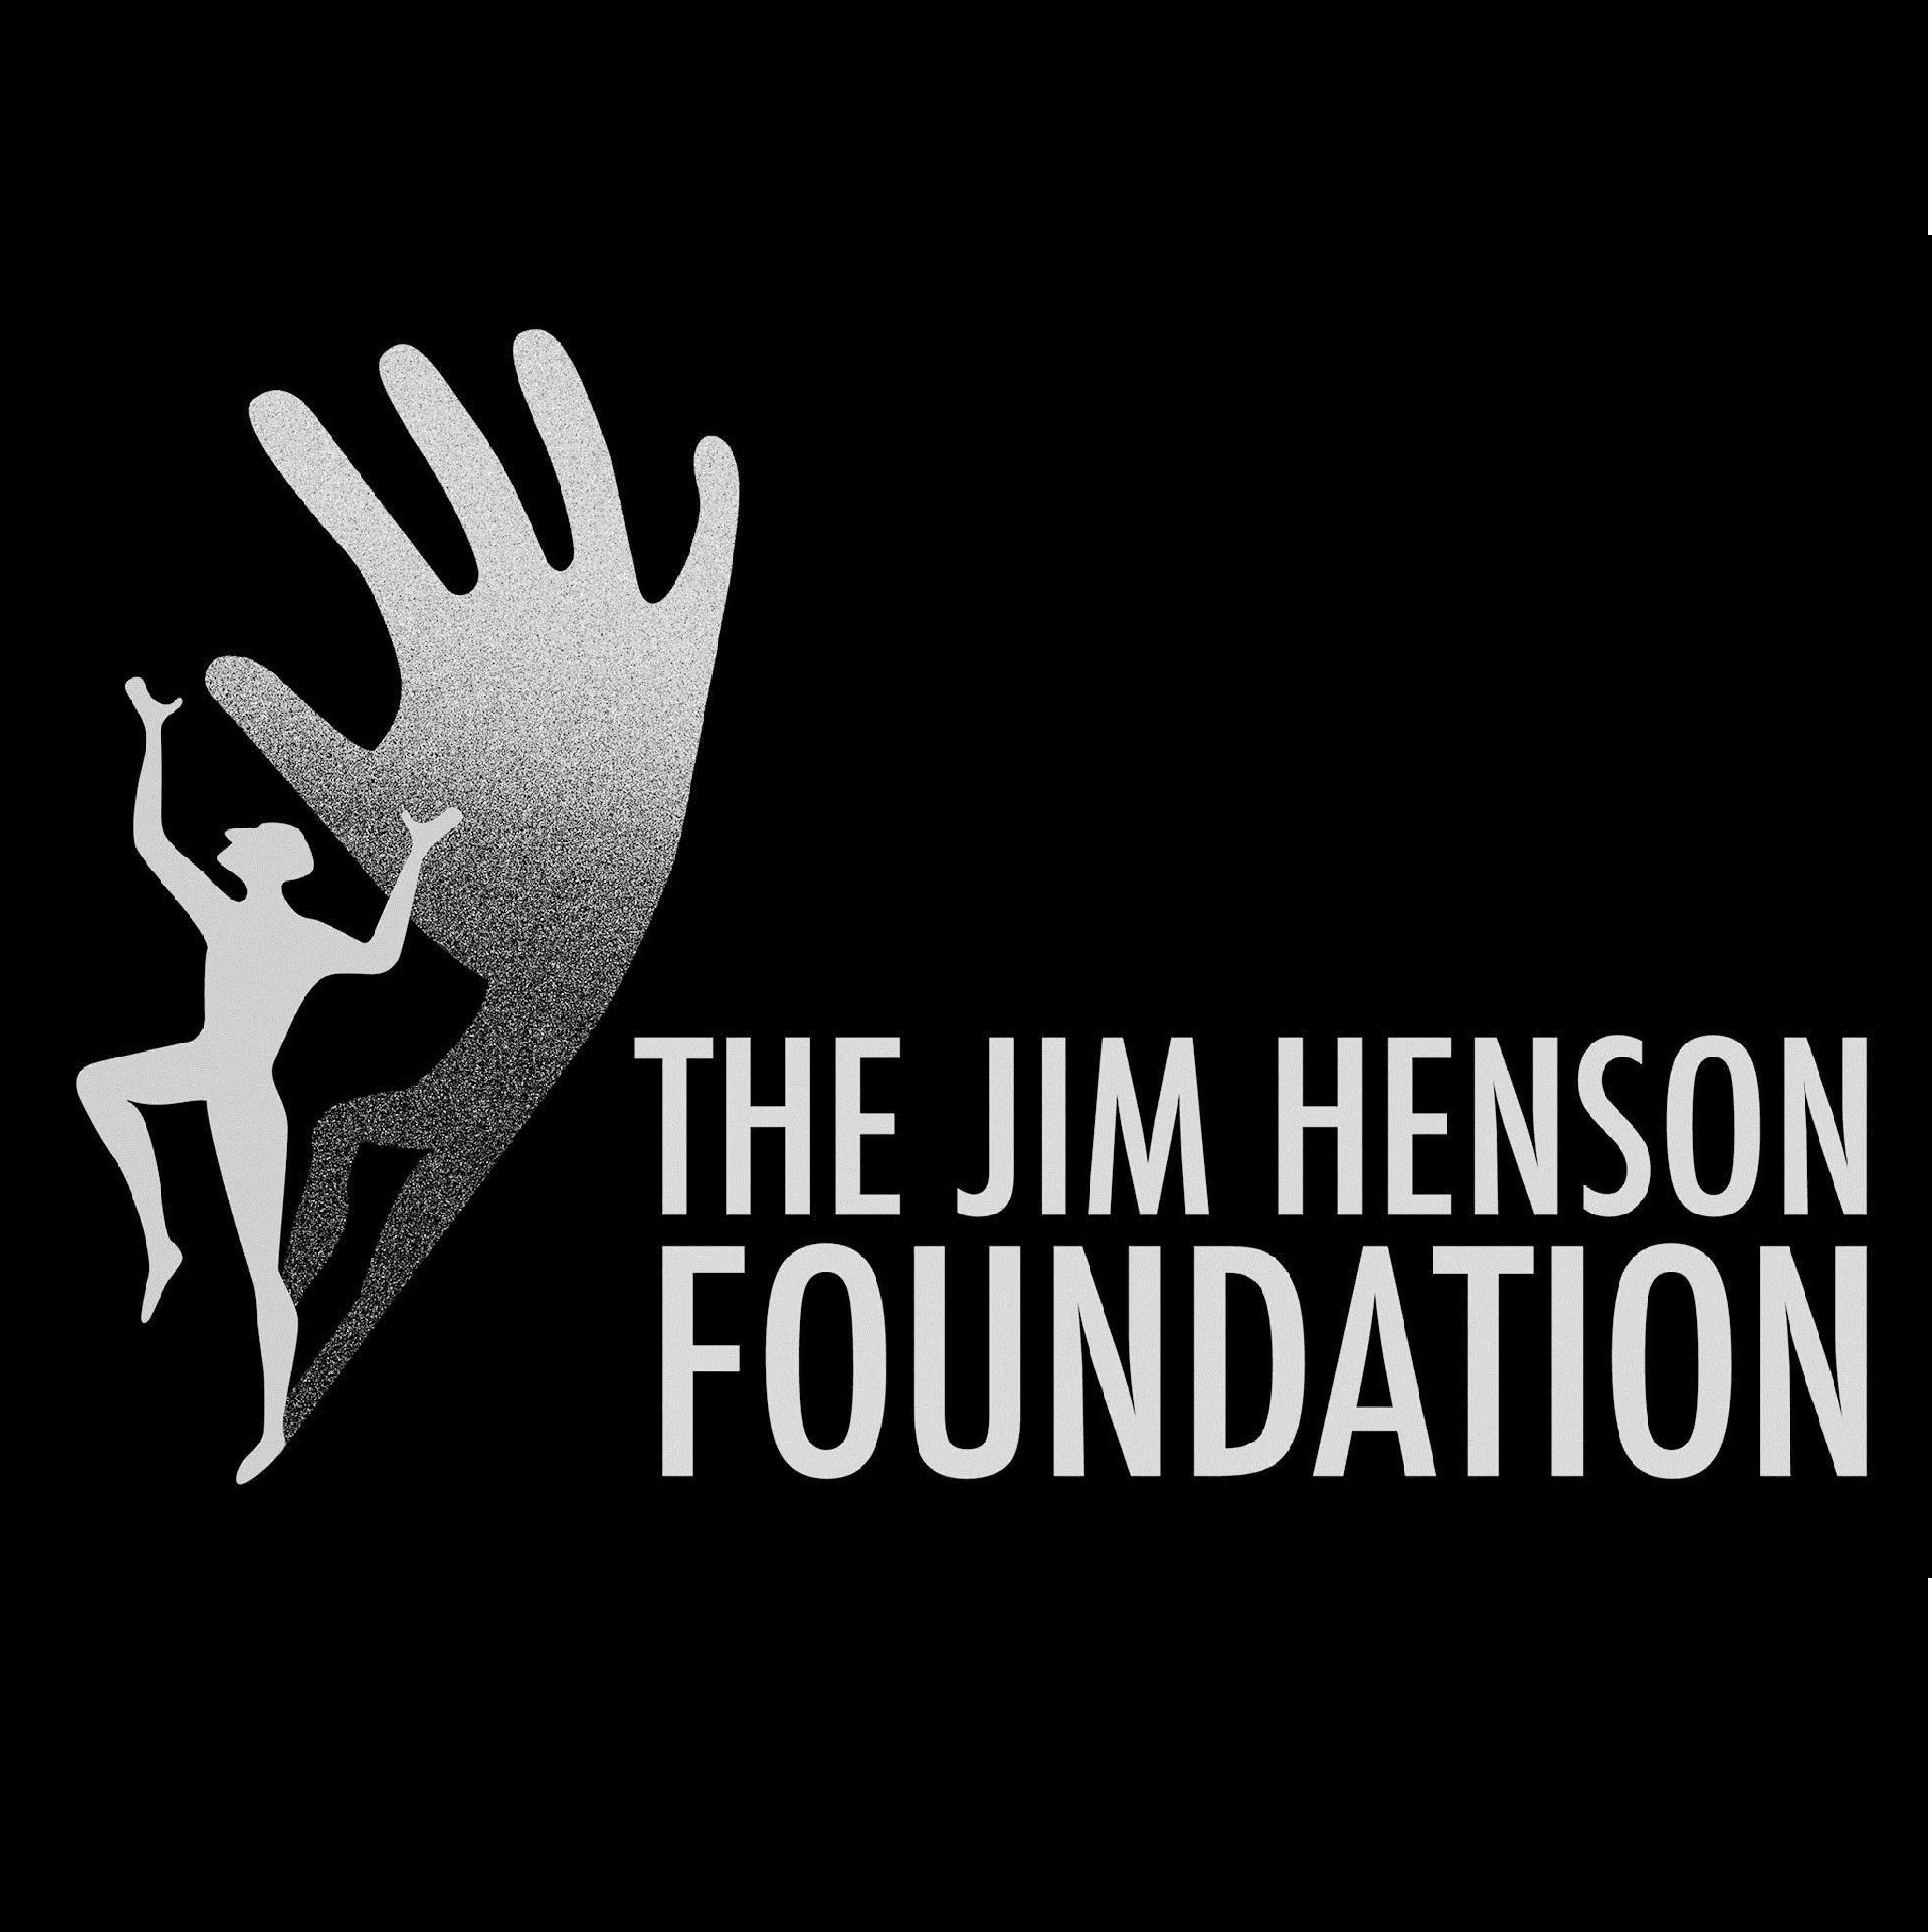 JimHenson-01.jpg